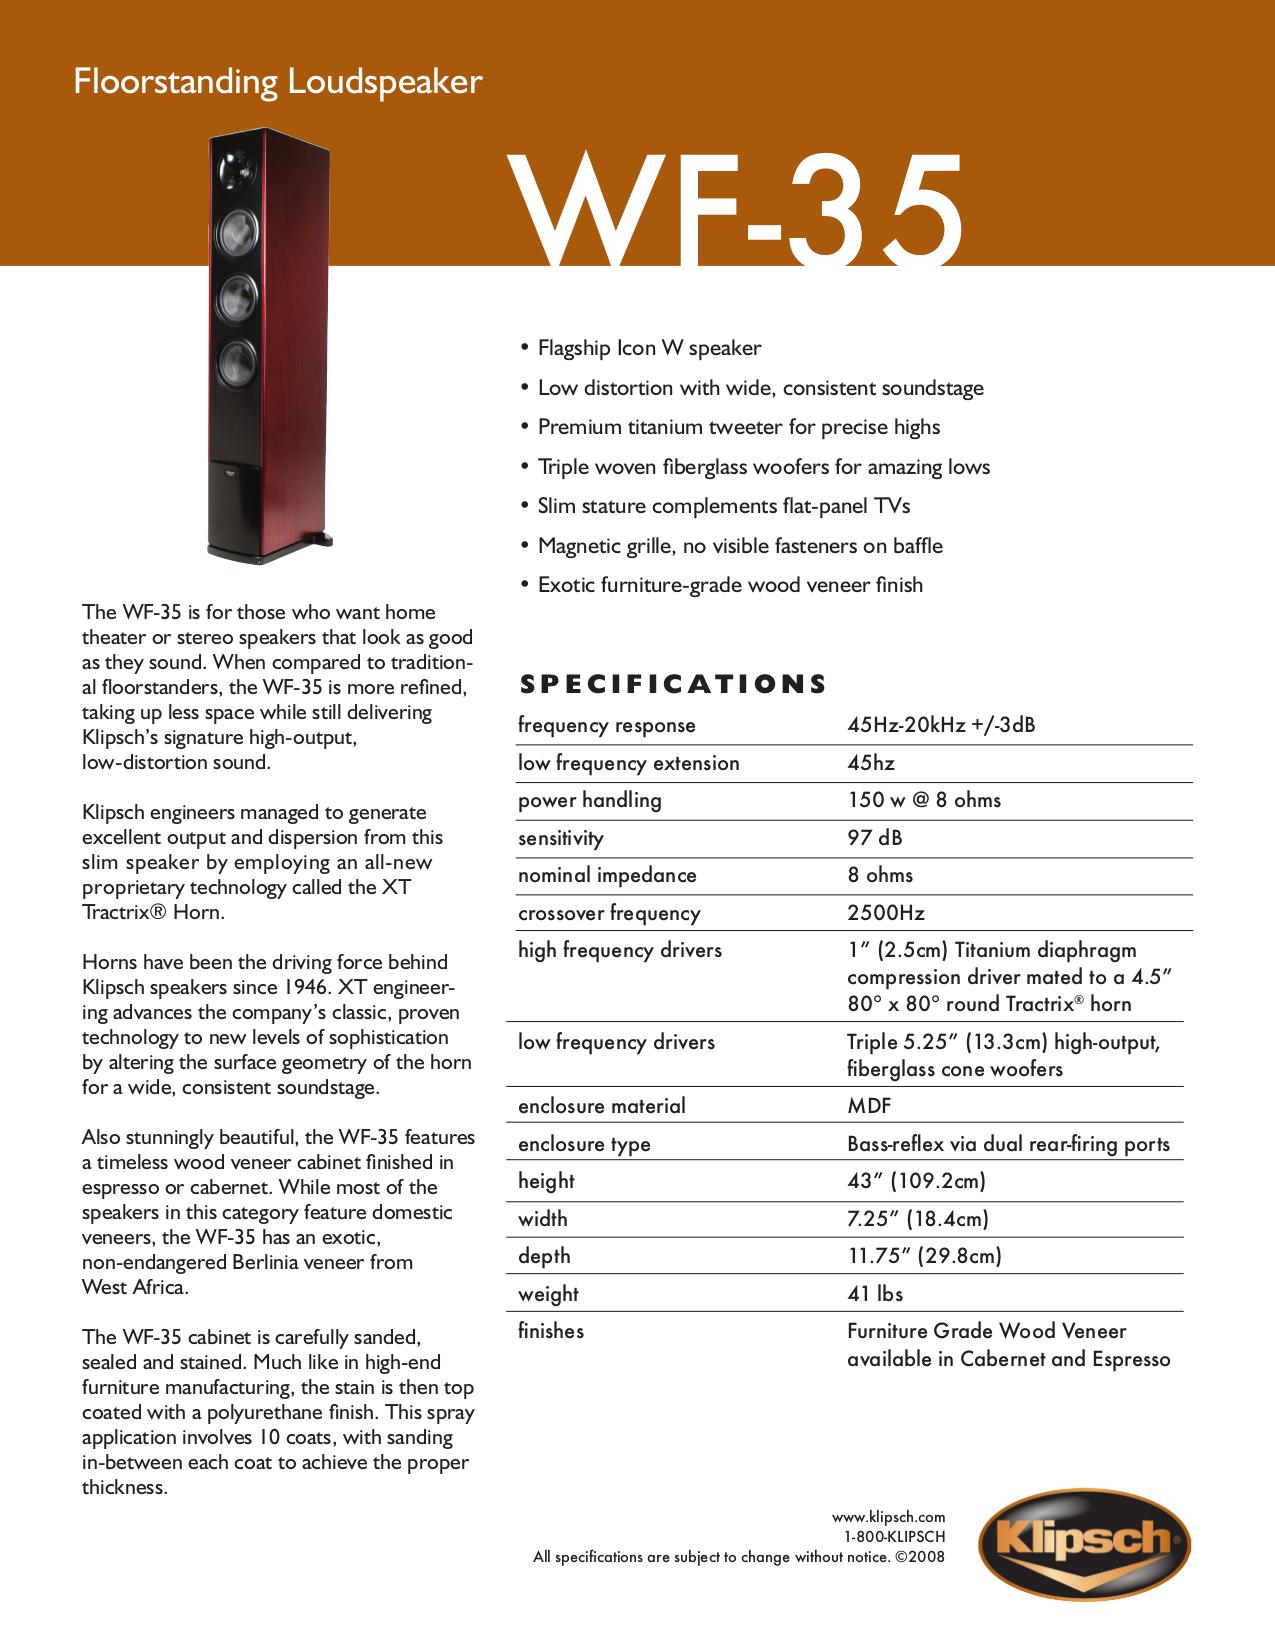 klipsch wf 35. Pdf For Klipsch Speaker WF-35 Manual Wf 35 I